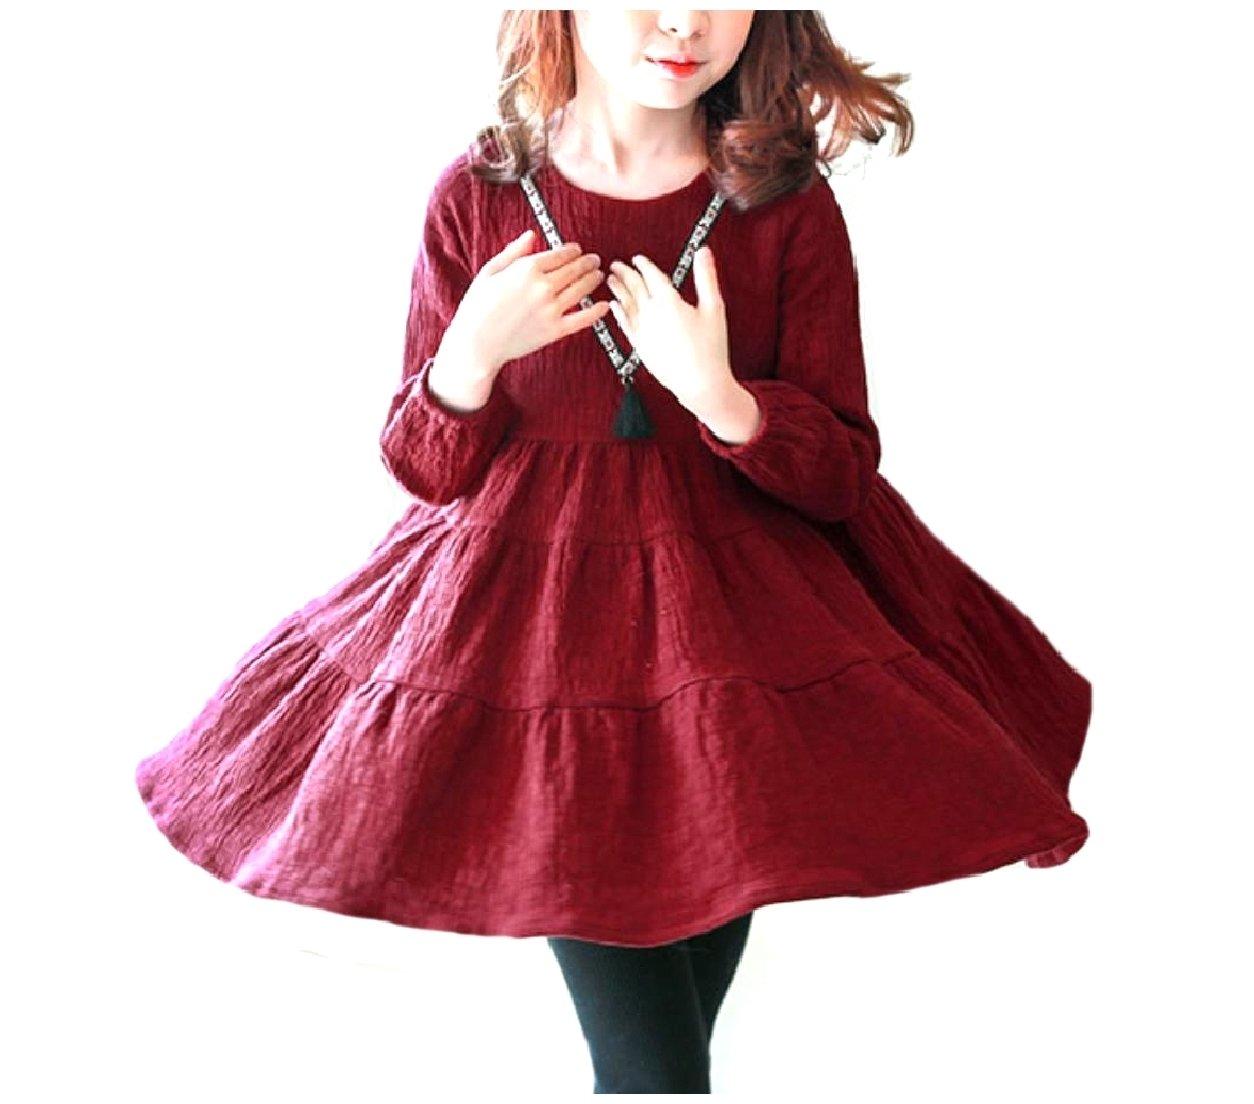 Zimaes Girls' Tassle Fine Cotton Rockabilly Longsleeve Dresses Clothes Wine Red 130